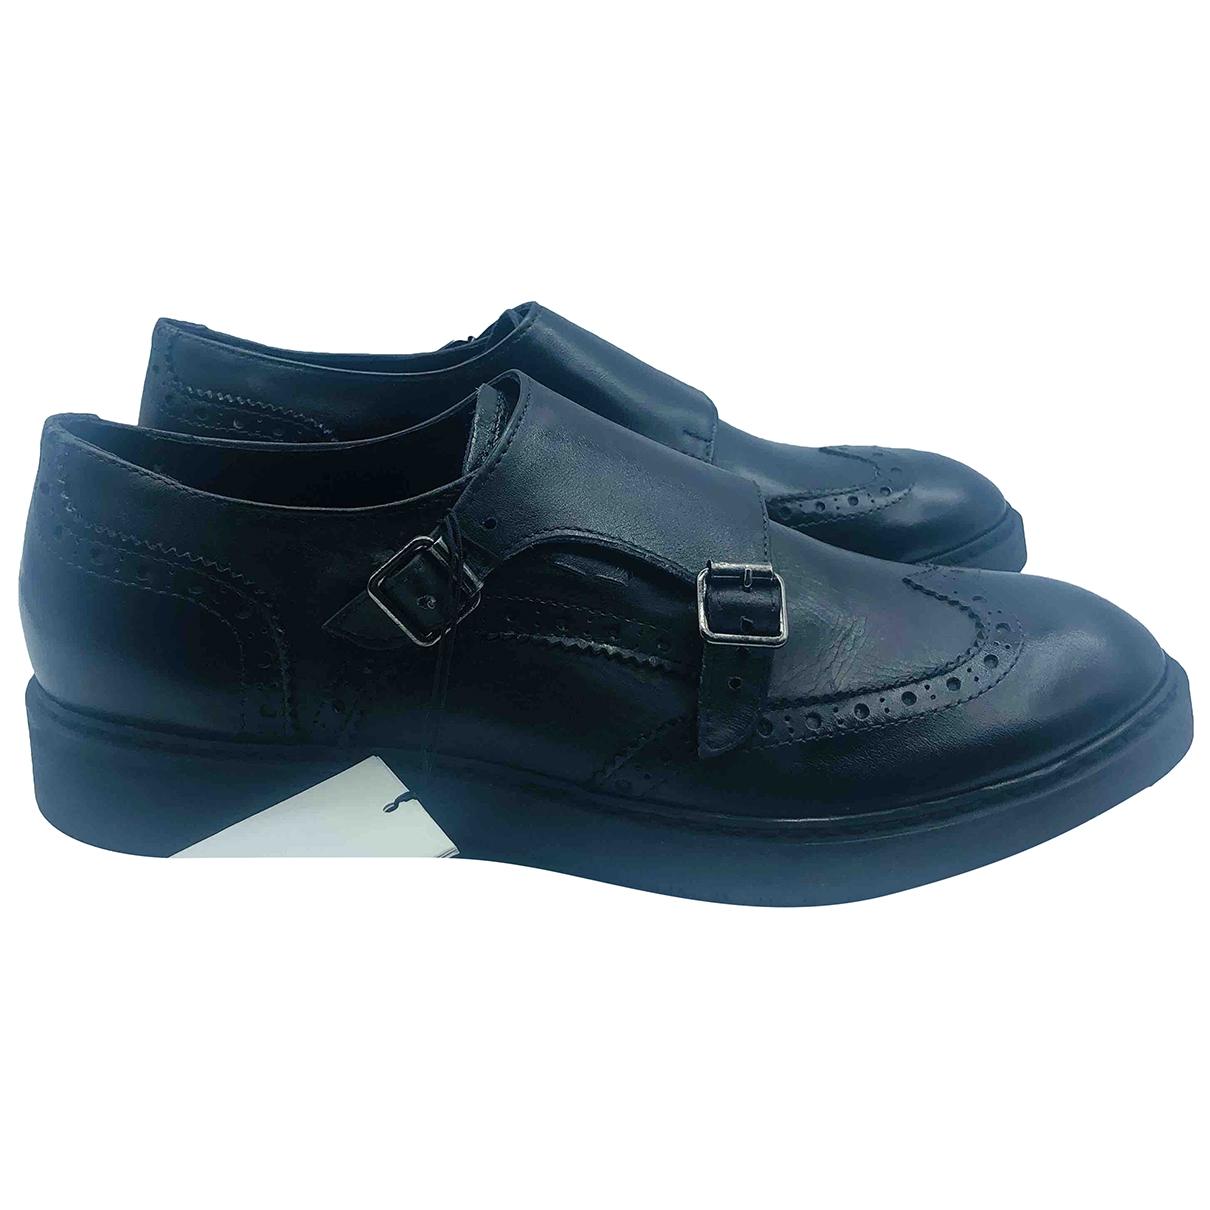 Trussardi \N Black Leather Flats for Men 45 EU